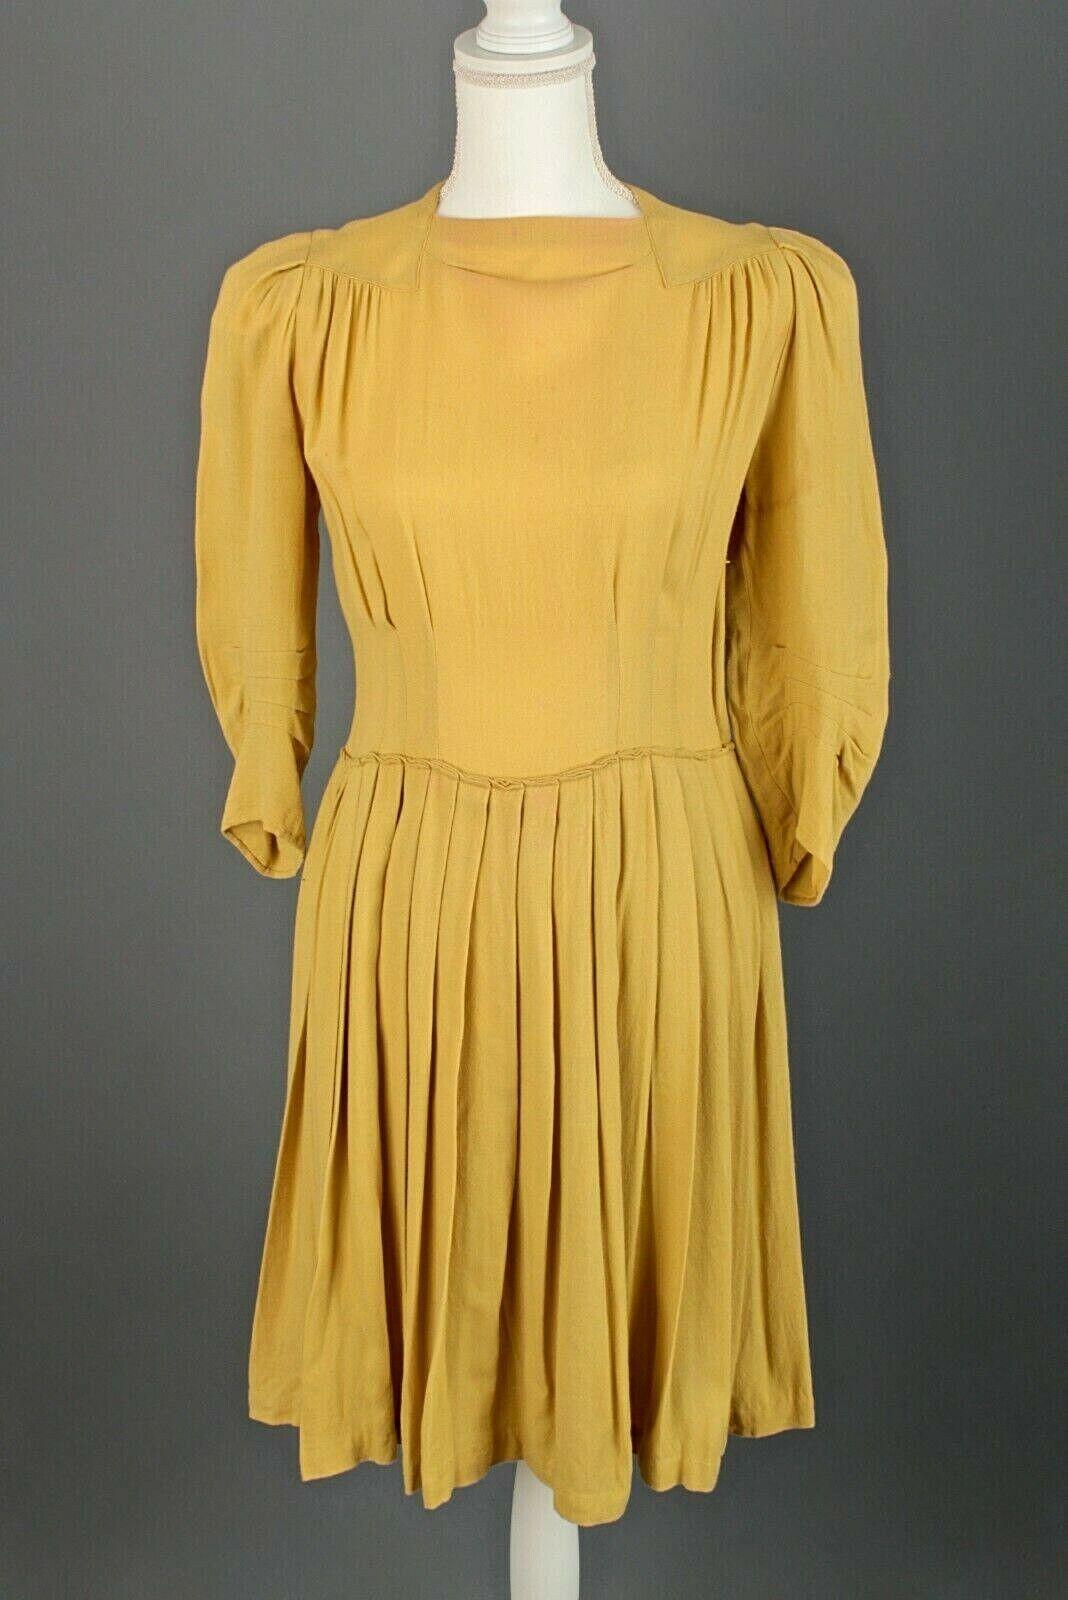 VTG Women's 40s Yellow Rayon Pleated Dress Sz M 1940s